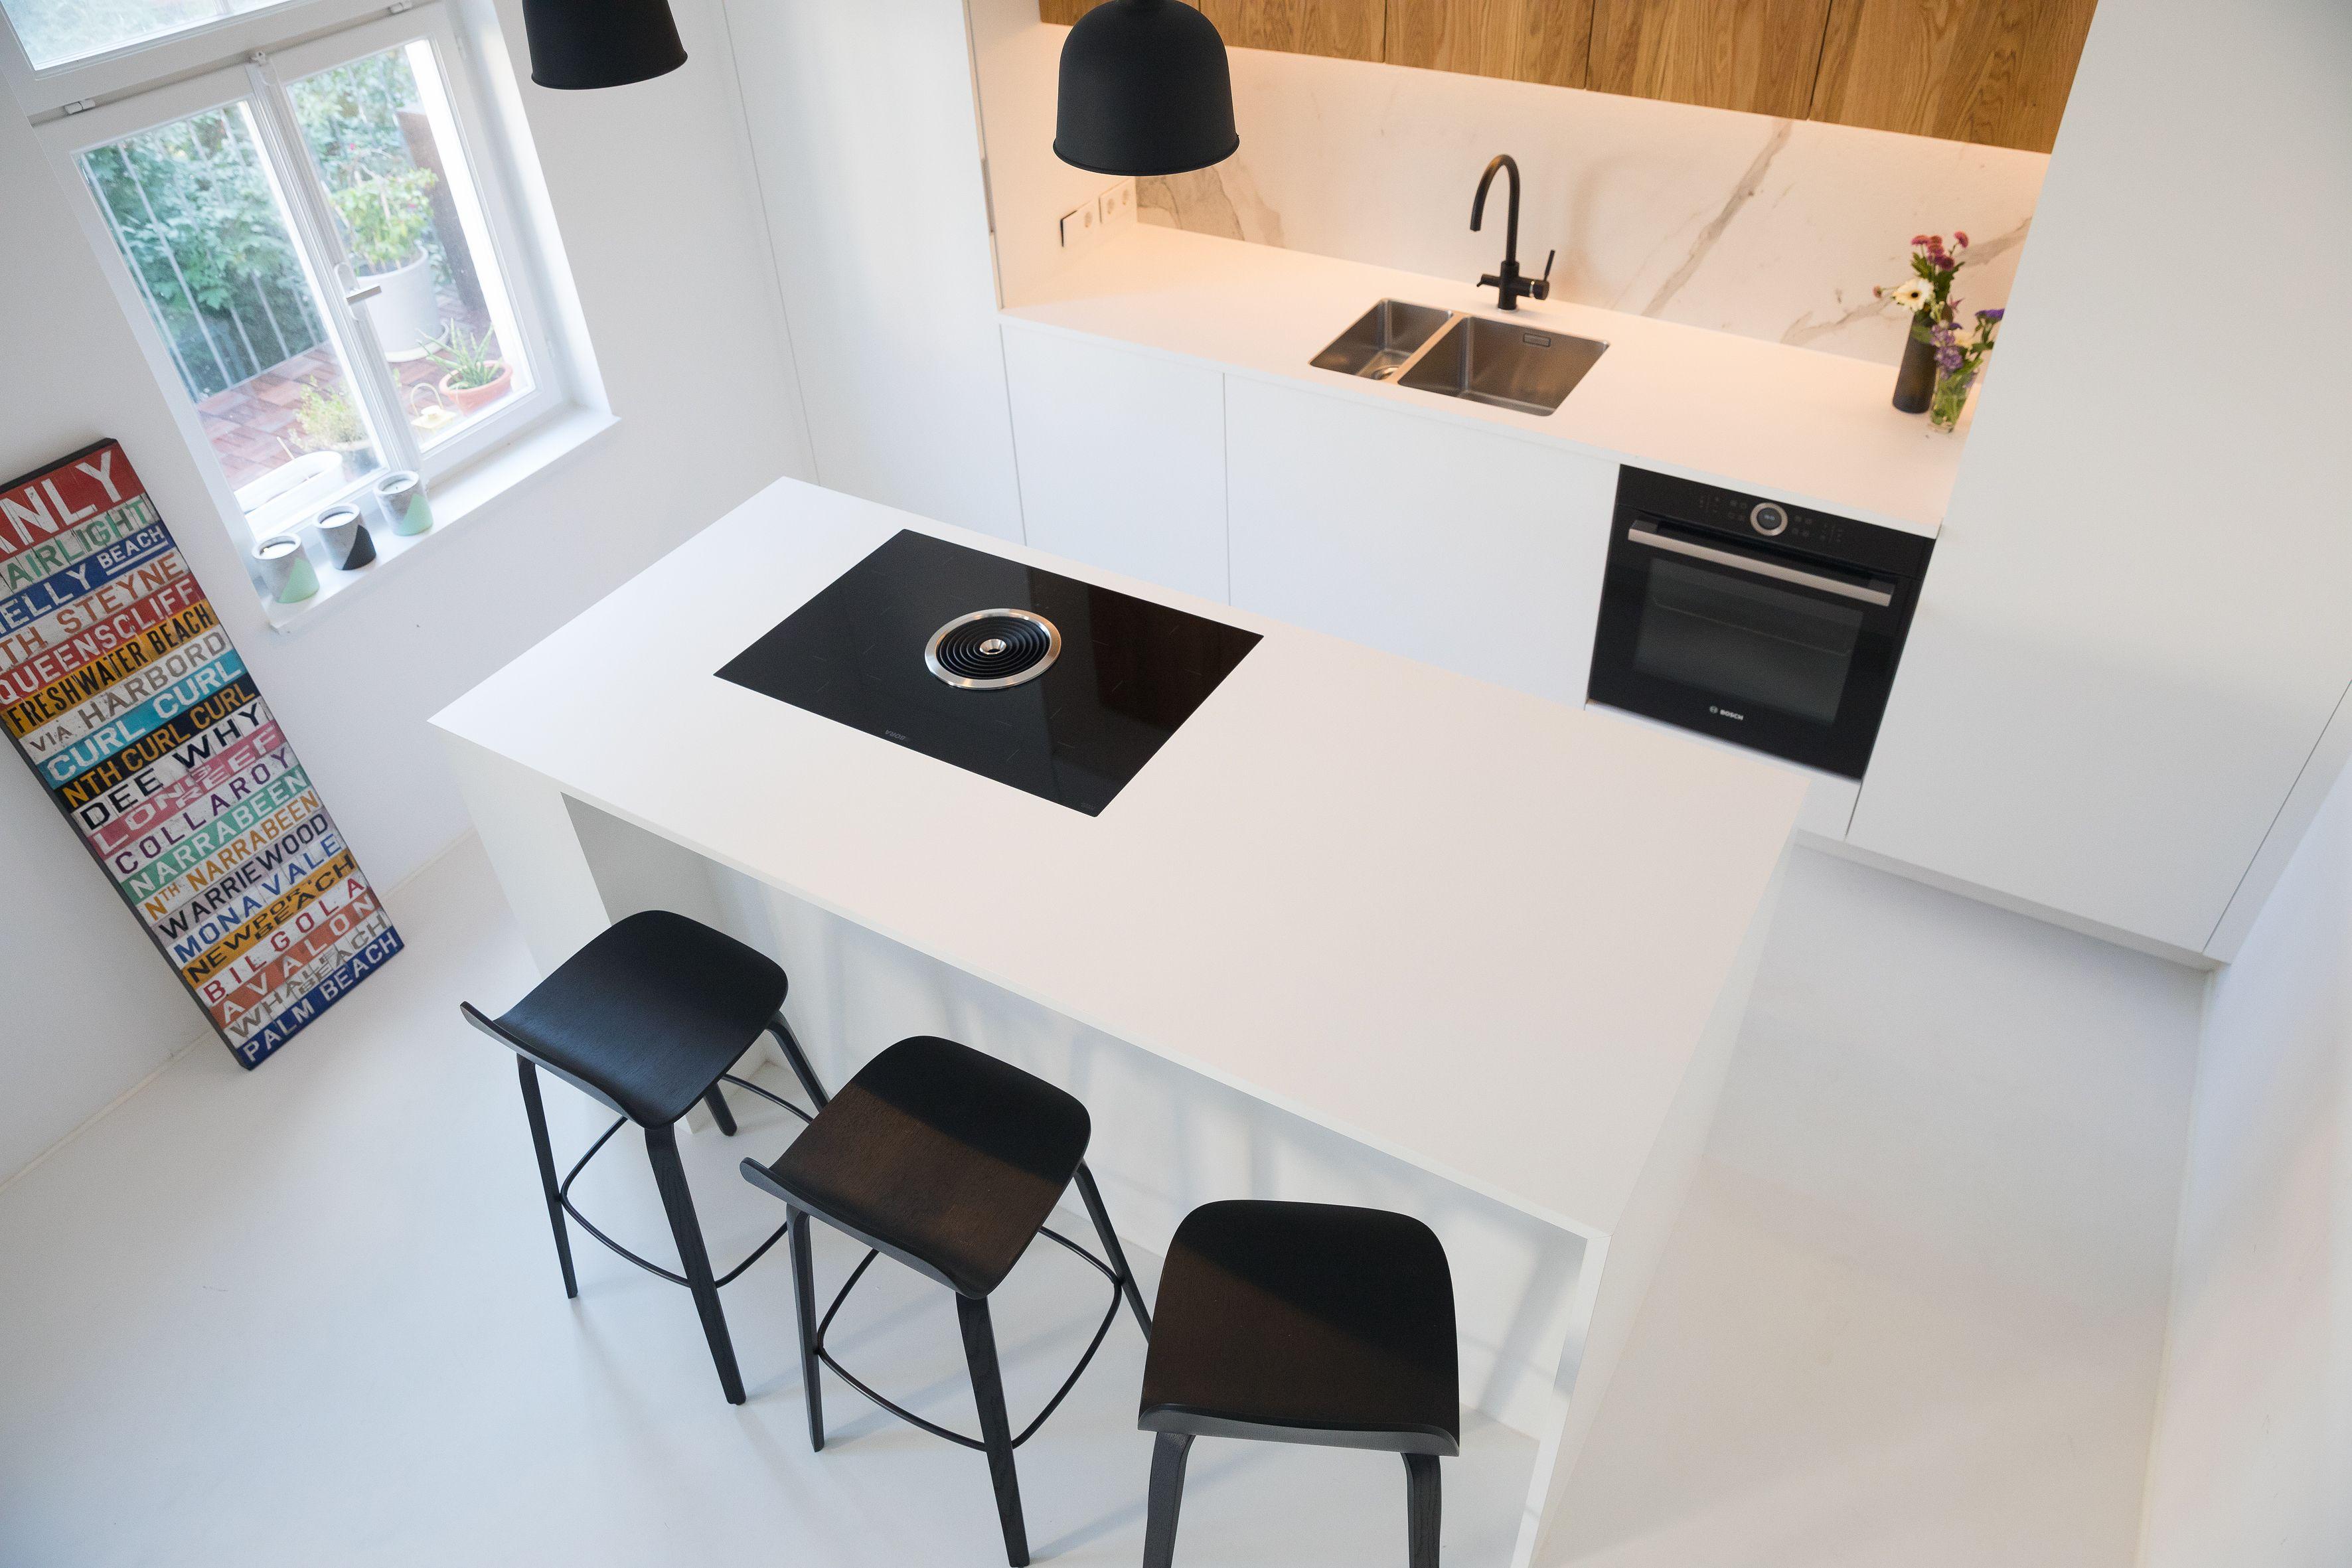 Weisse Kuche Kuche Planen Kuchenplanung Kucheninspiration Inspiration Design Ideen Minimalistisc Kleine Kuche Moderne Kuche Kuche Planen